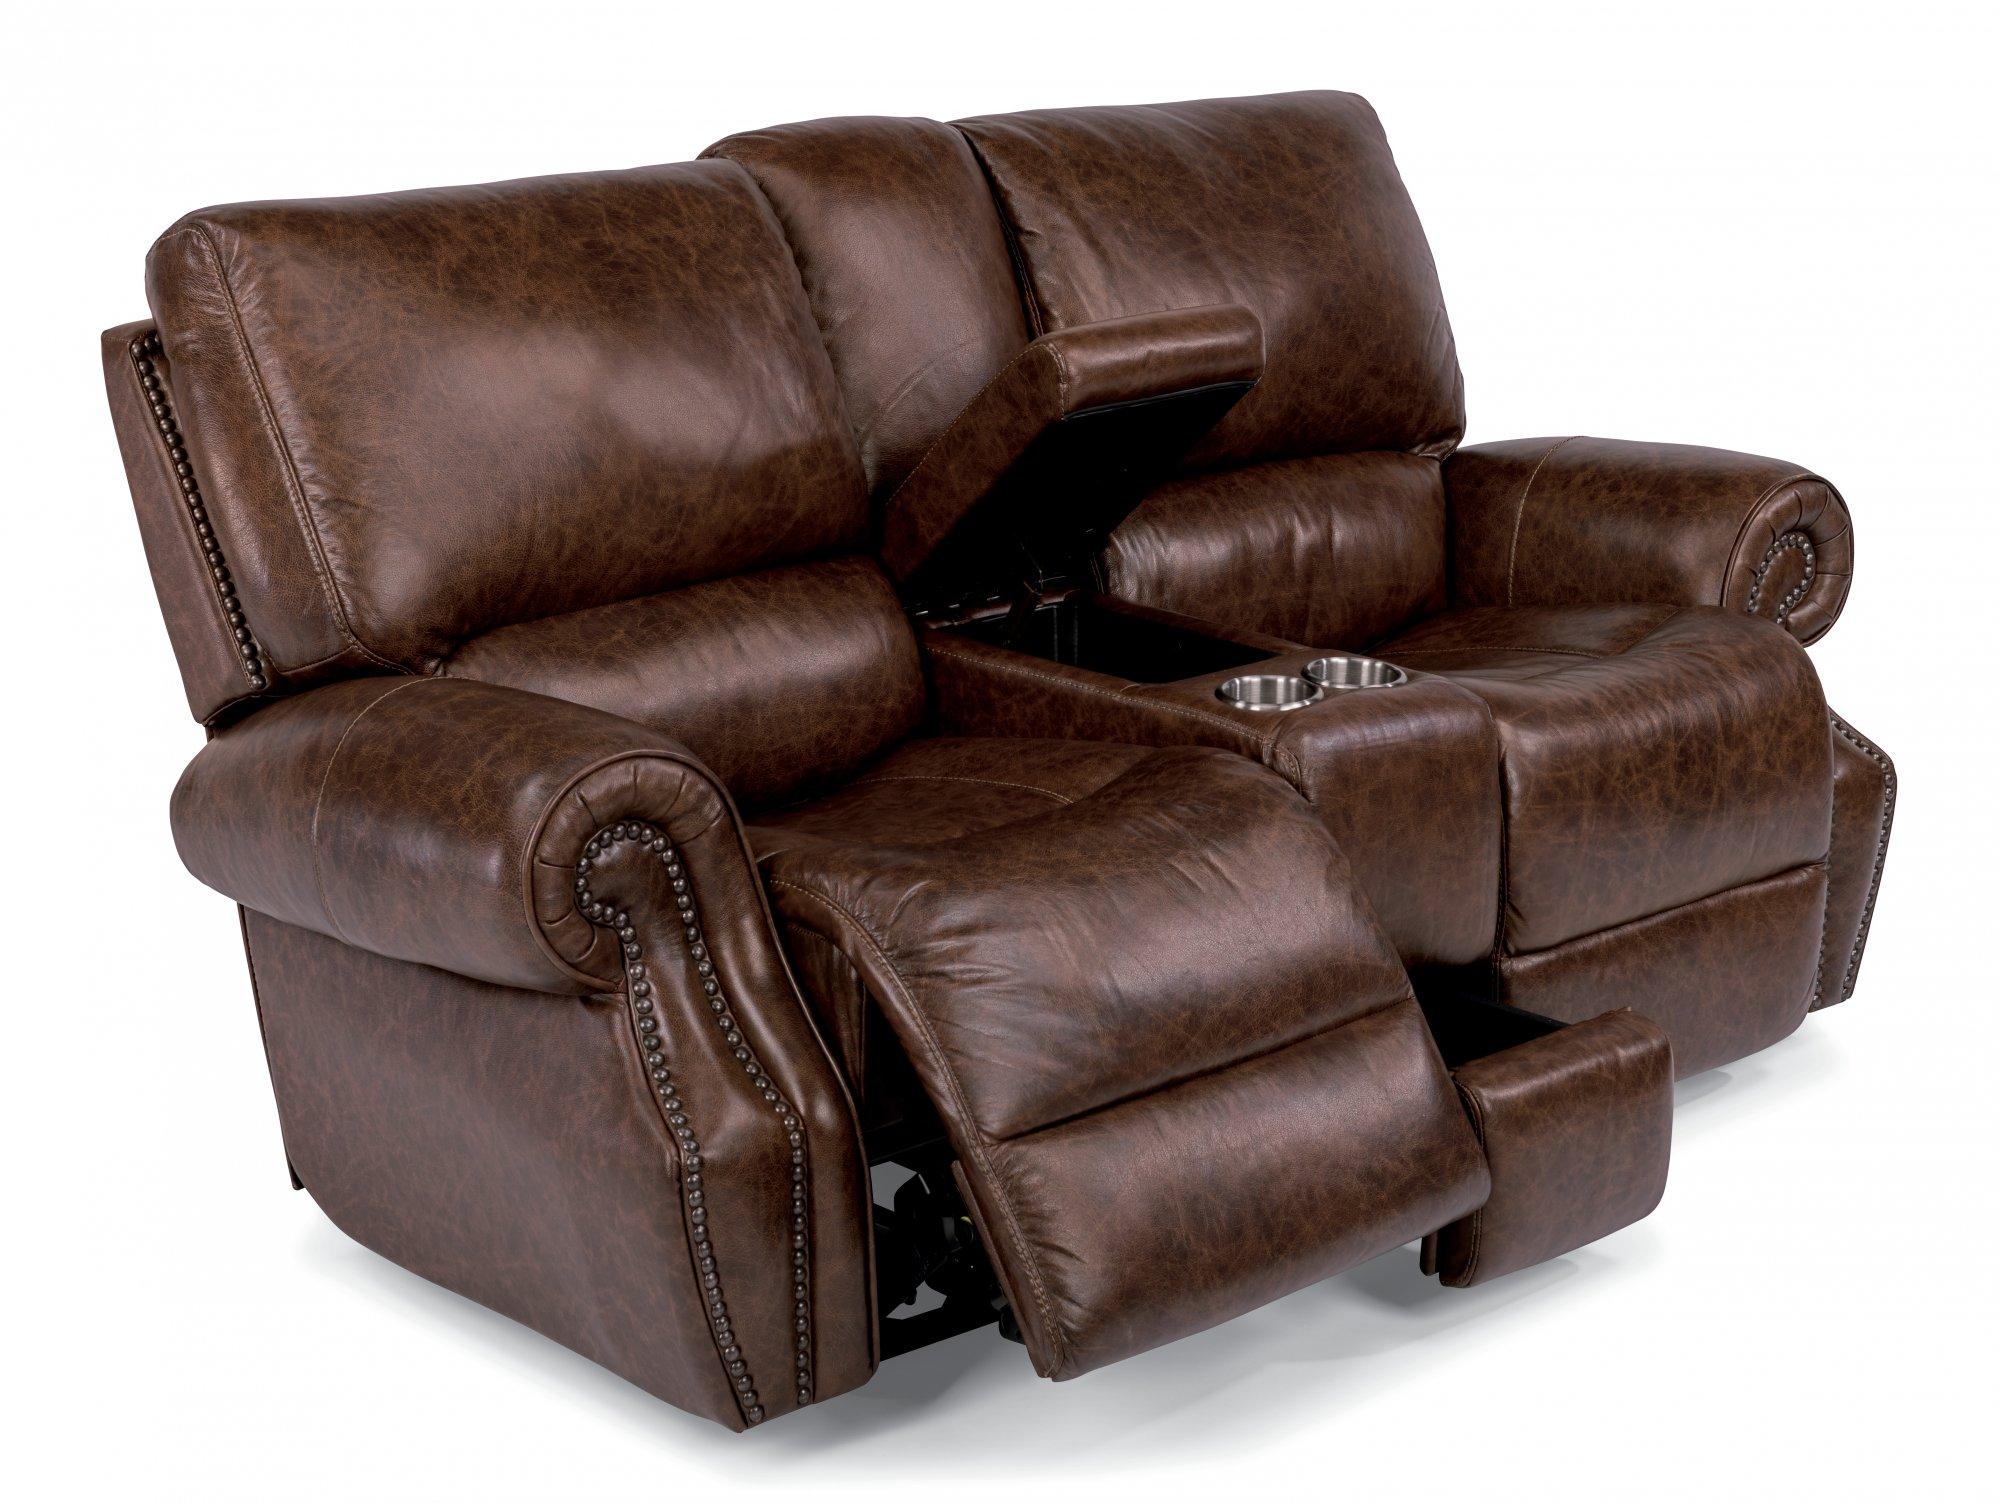 Prime Flexsteel Craig Appliance And Furniture Machost Co Dining Chair Design Ideas Machostcouk